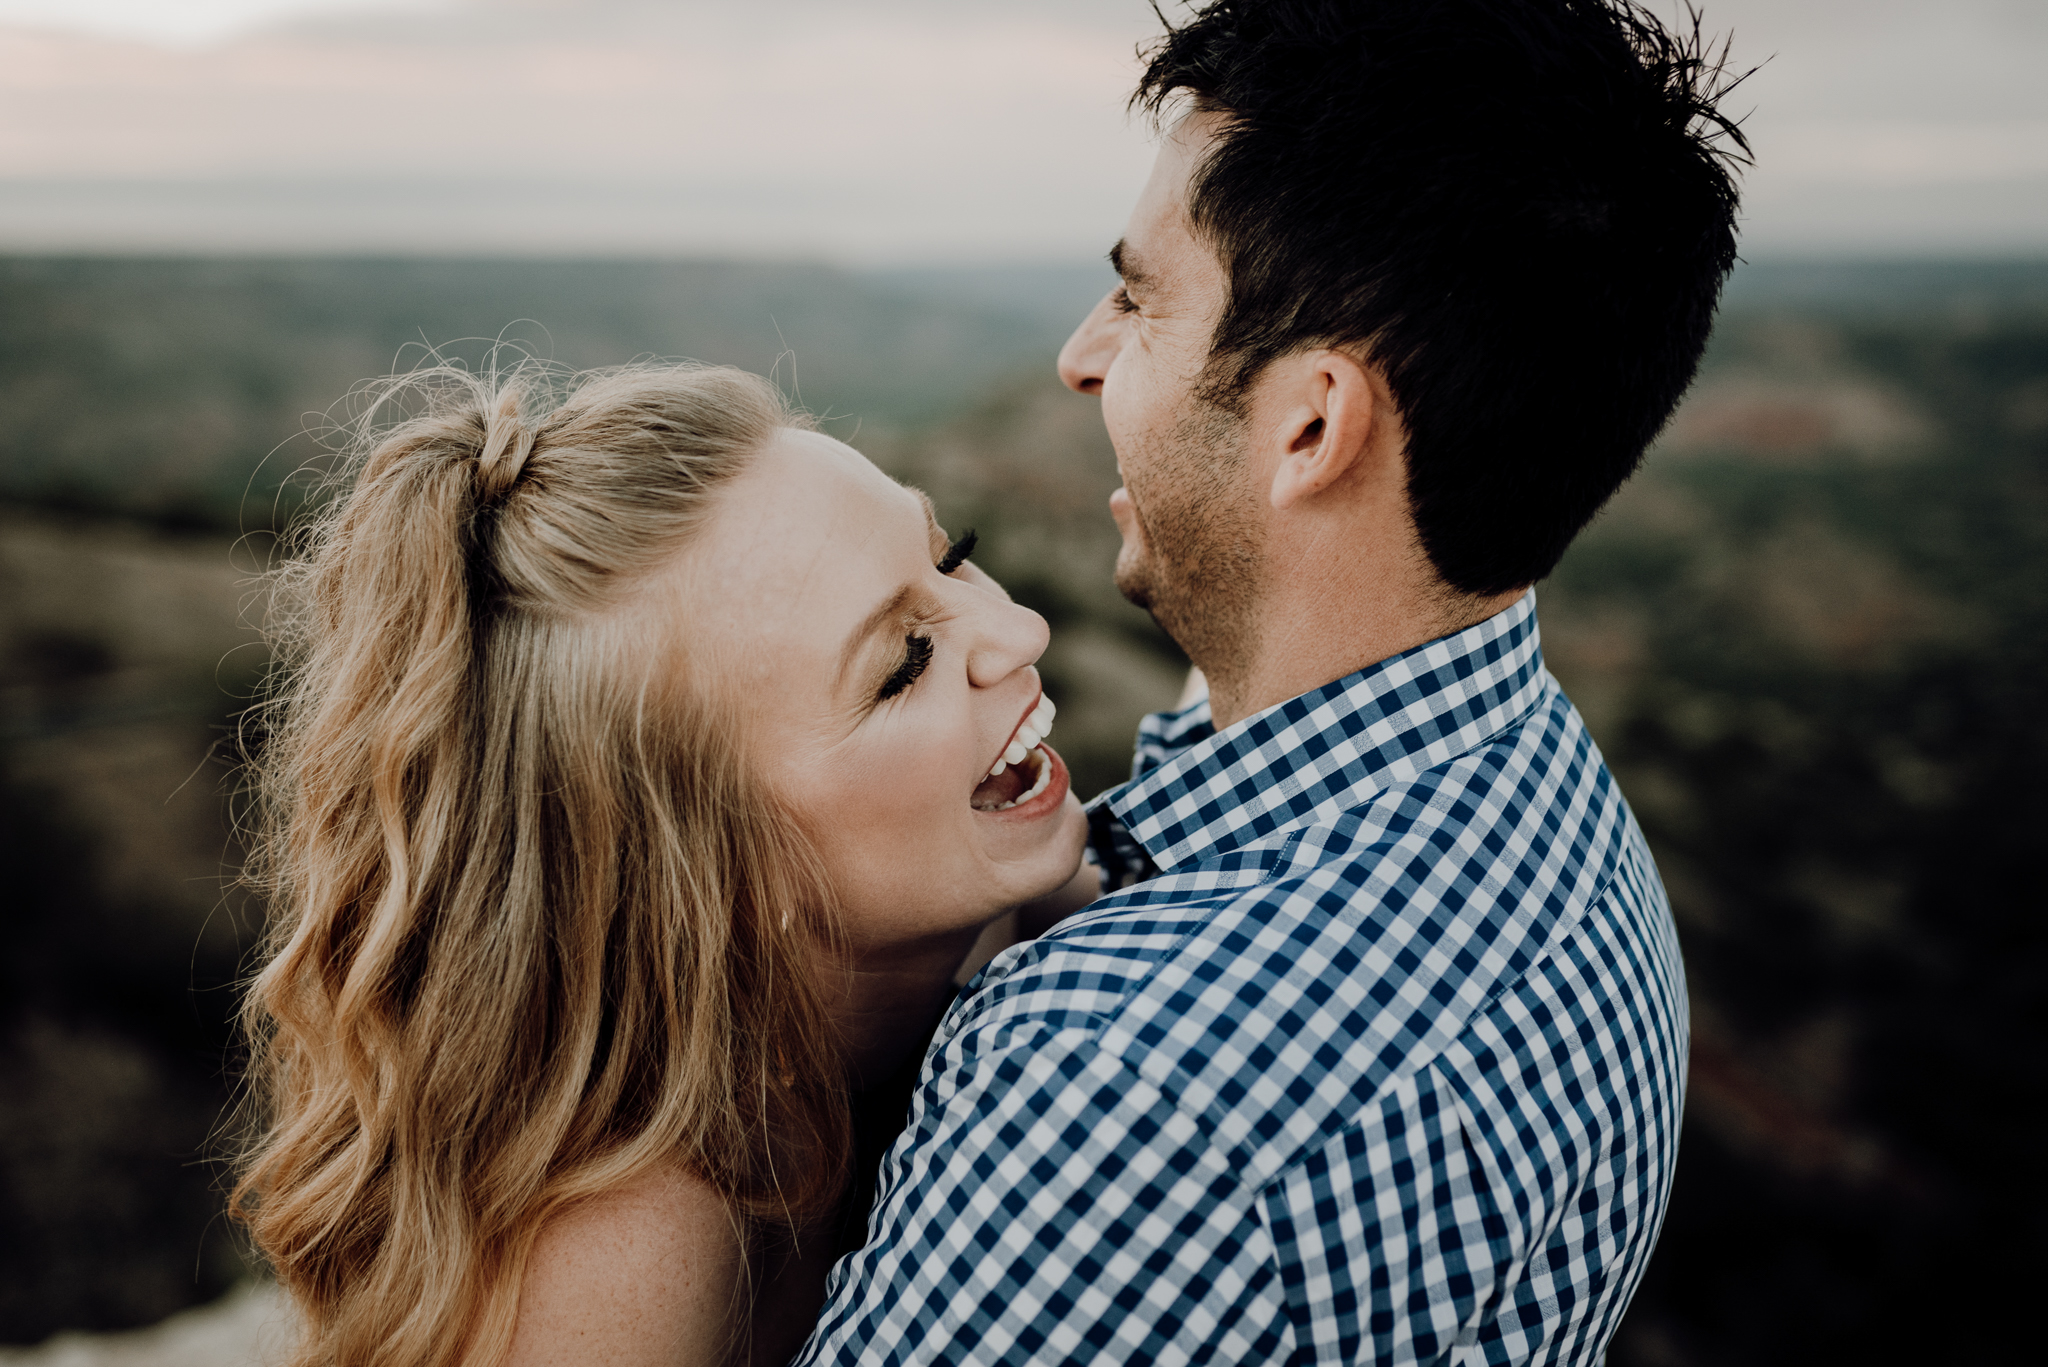 Houston Wedding Photographer-Palo Duro Canyon Engagement Session- Houston Wedding Photographer -Kristen Giles Photography-14.jpg